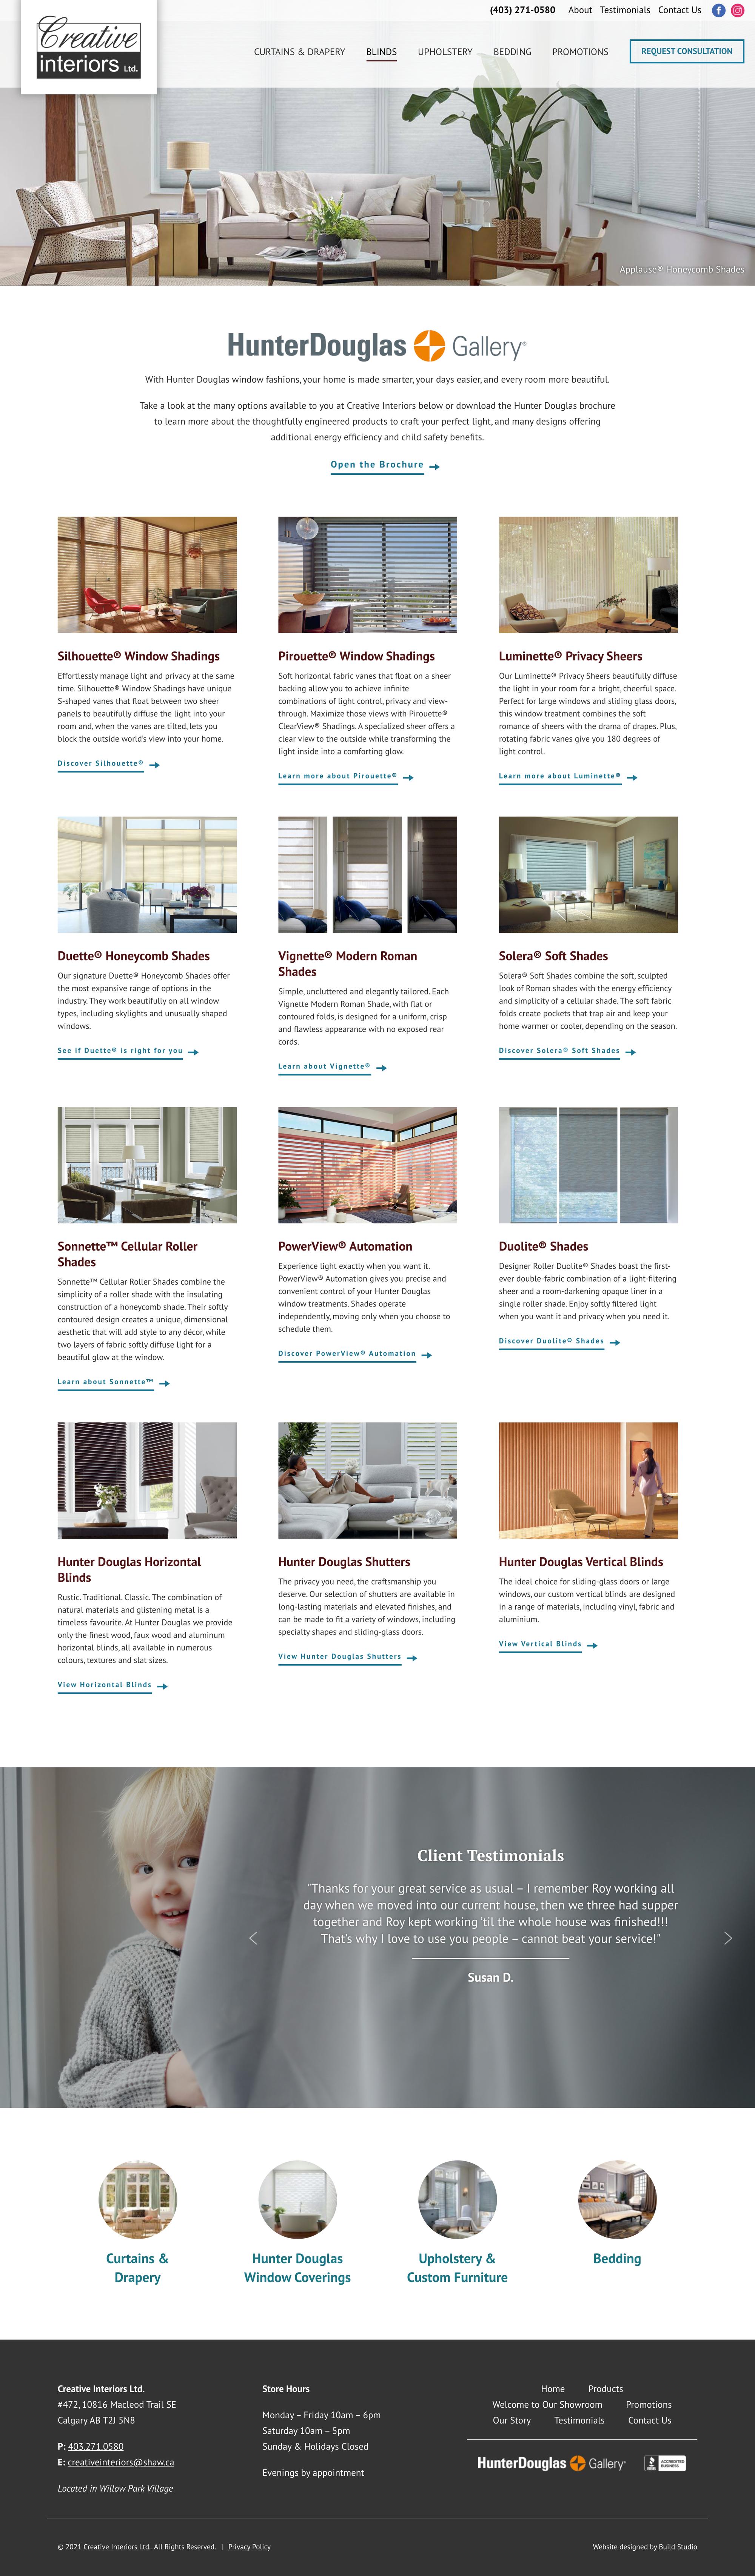 Creative Interiors Calgary Website Blinds